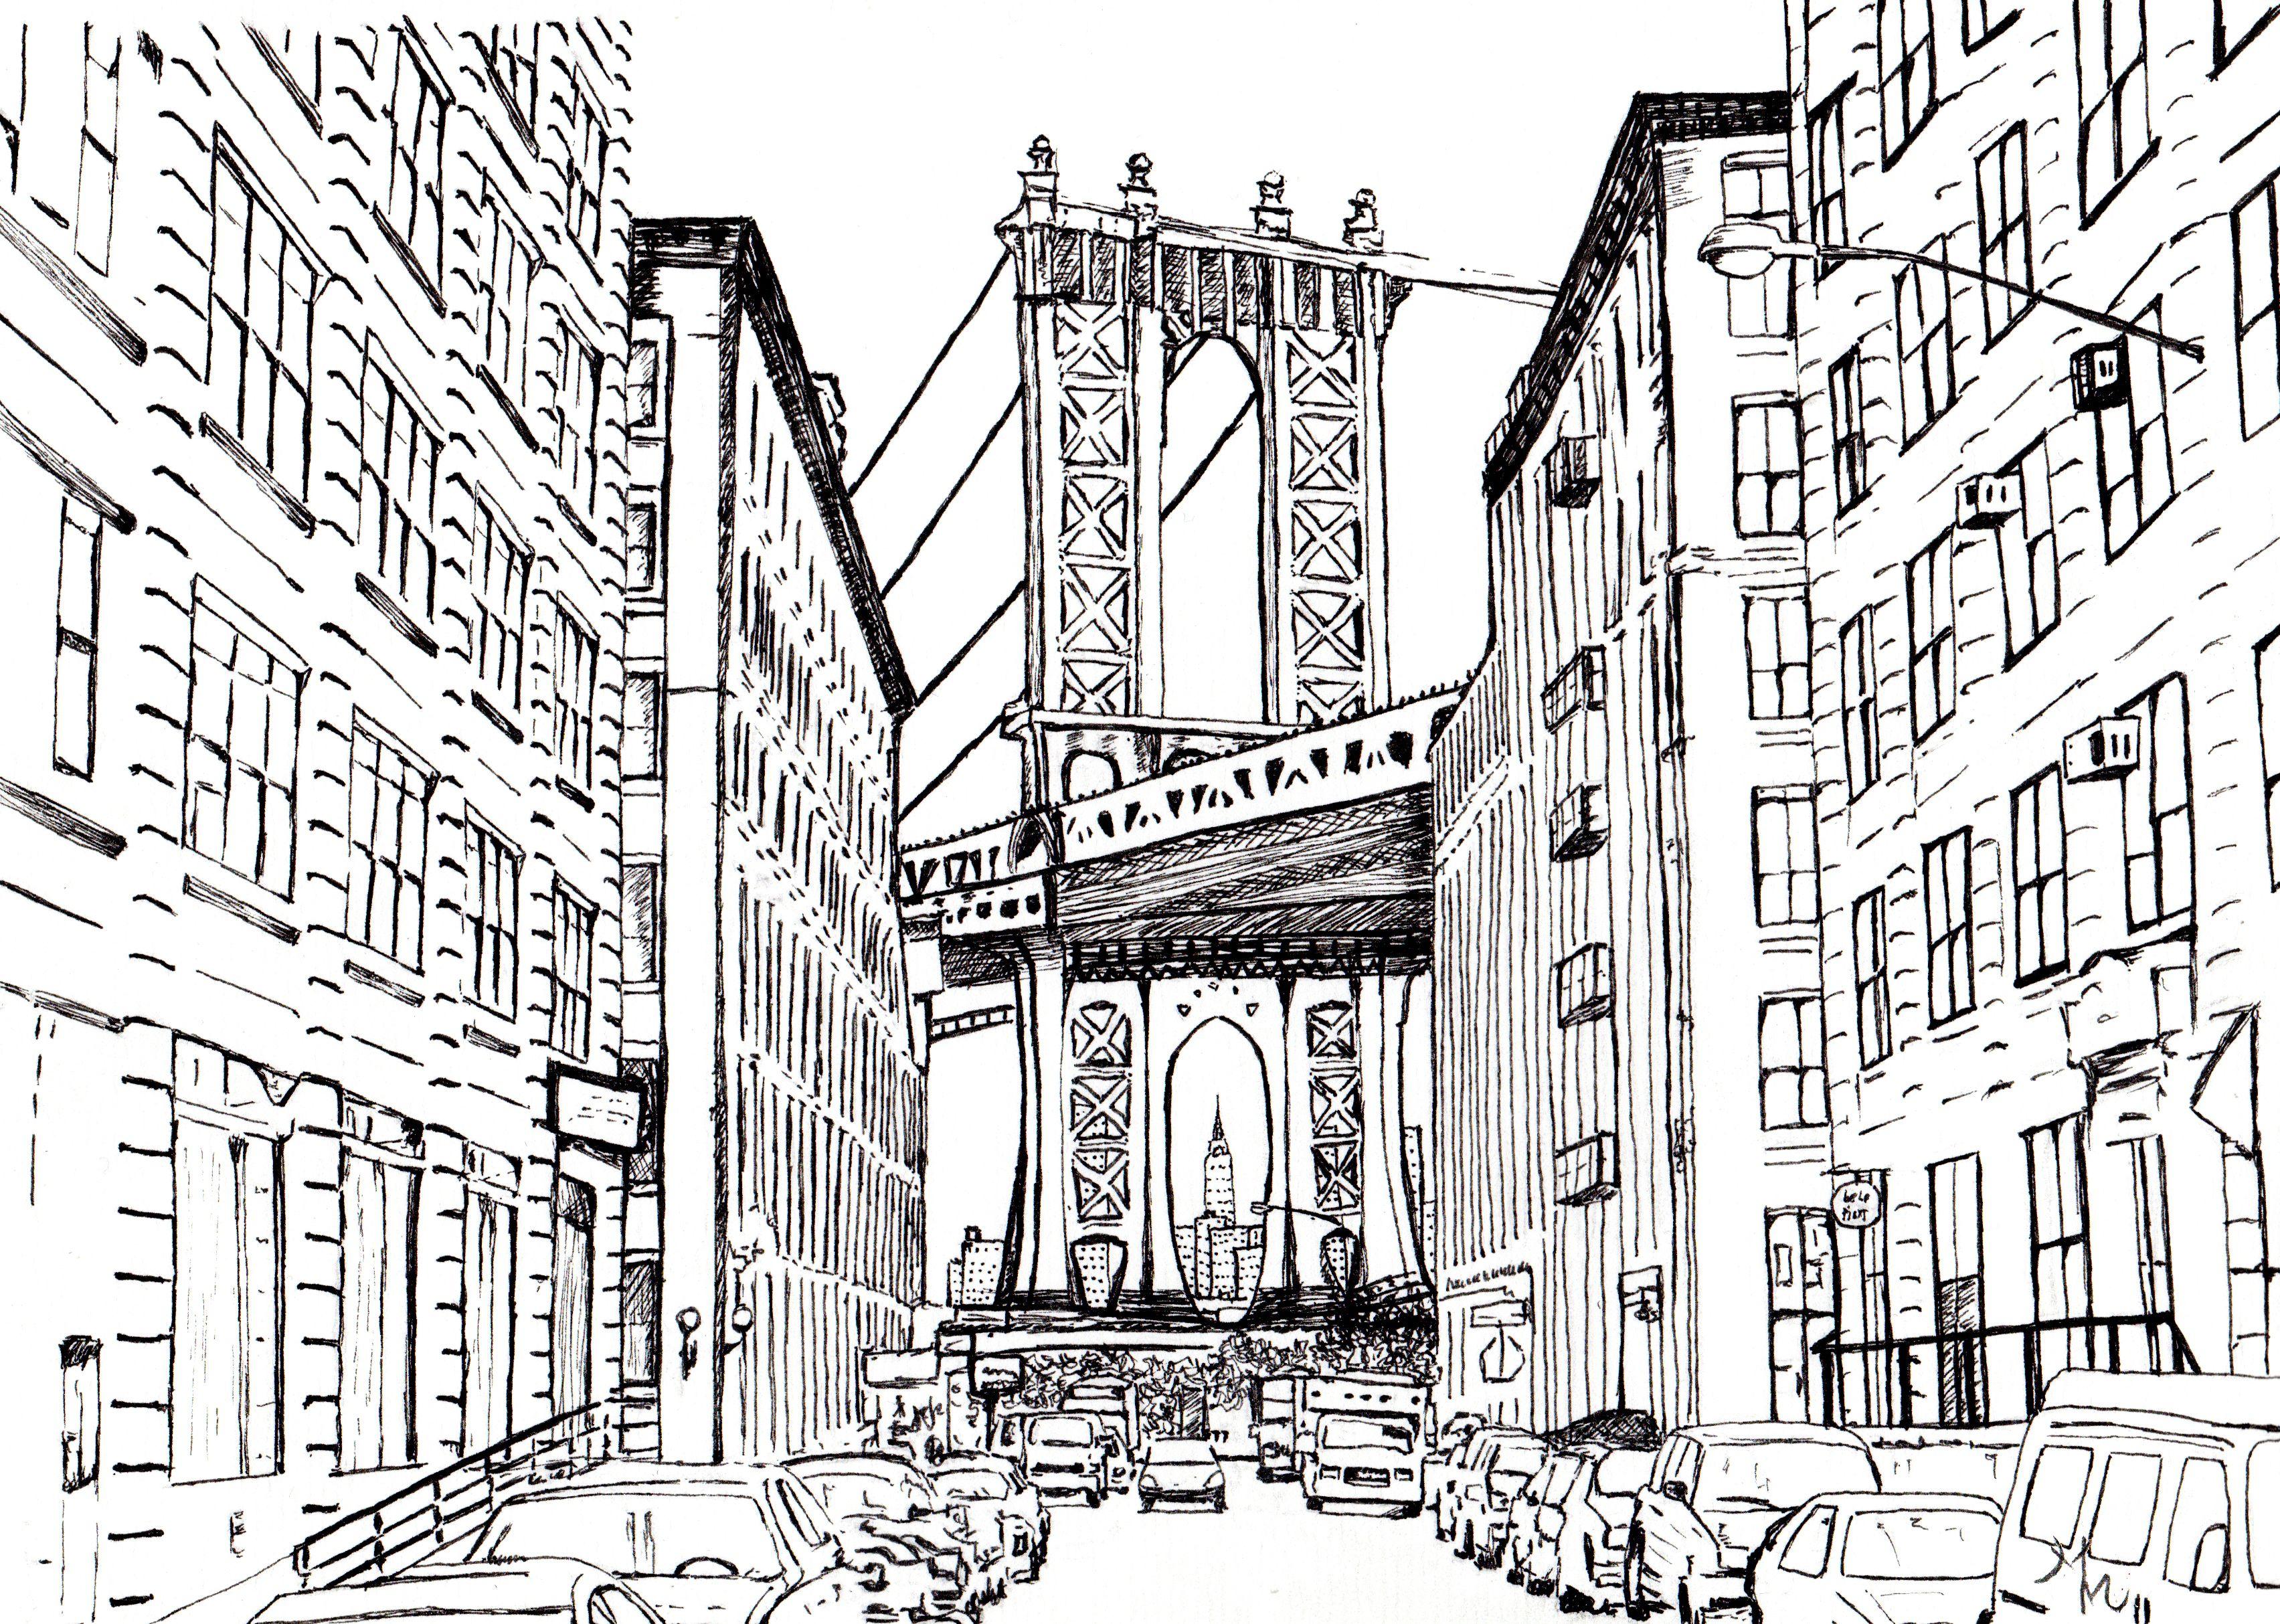 new york dessins pinterest feutre noir feutres et york. Black Bedroom Furniture Sets. Home Design Ideas